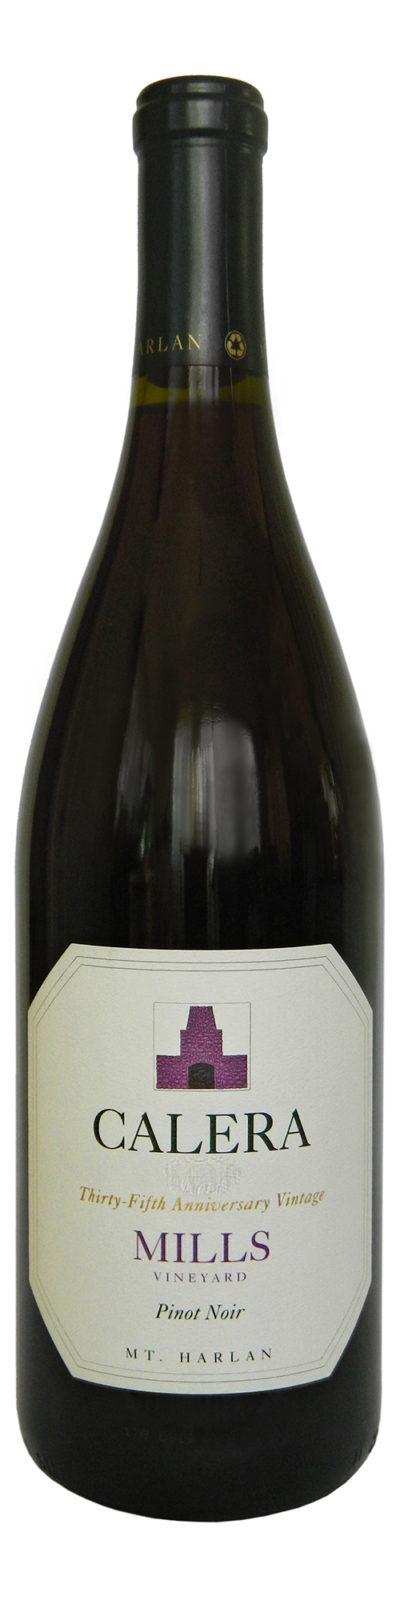 Calera Mills Pinot Noir